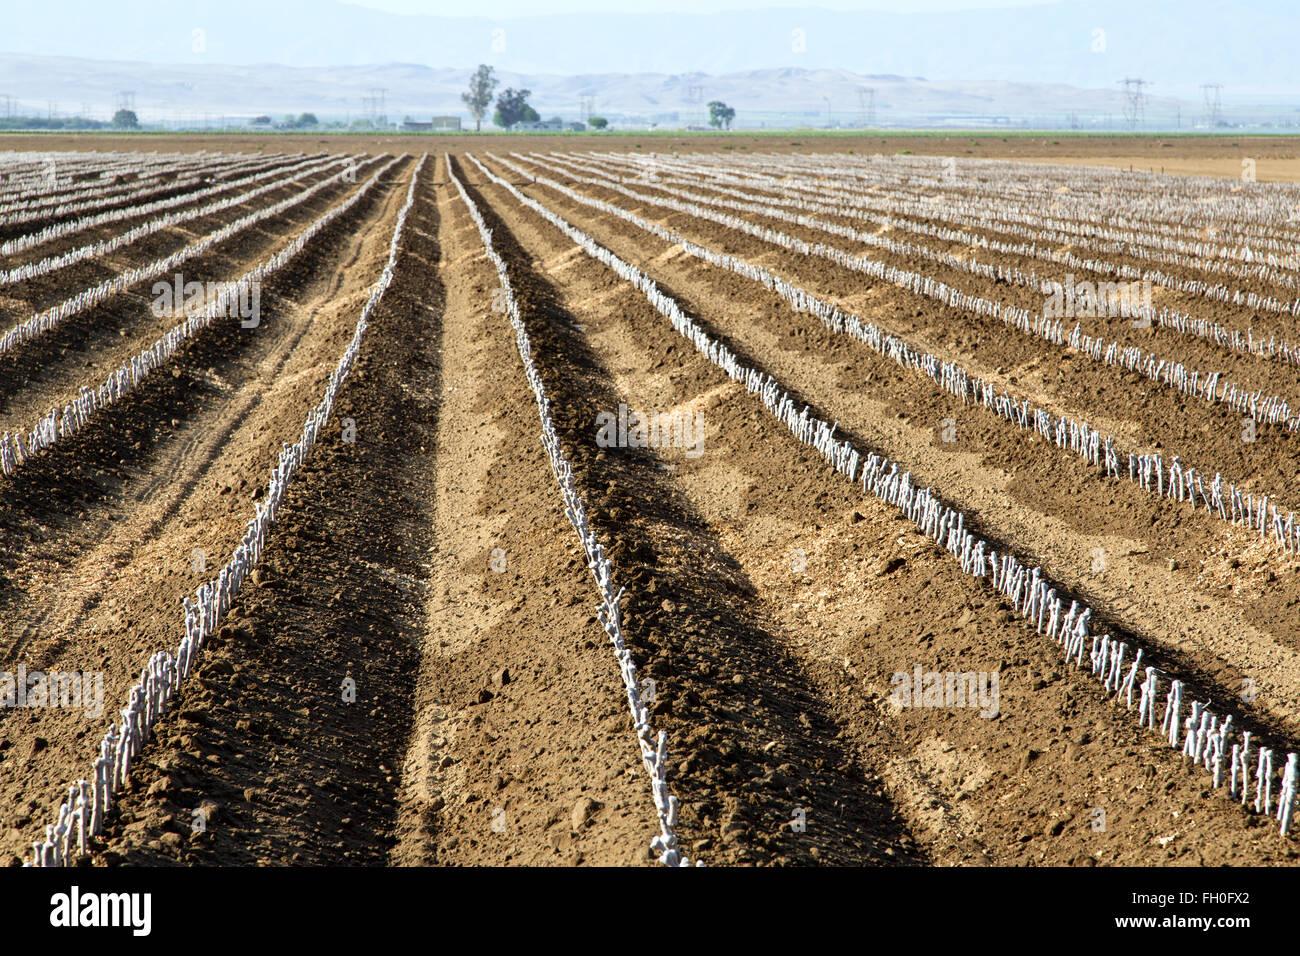 Hardwood cuttings of grape stock, field planting, Kern County. - Stock Image